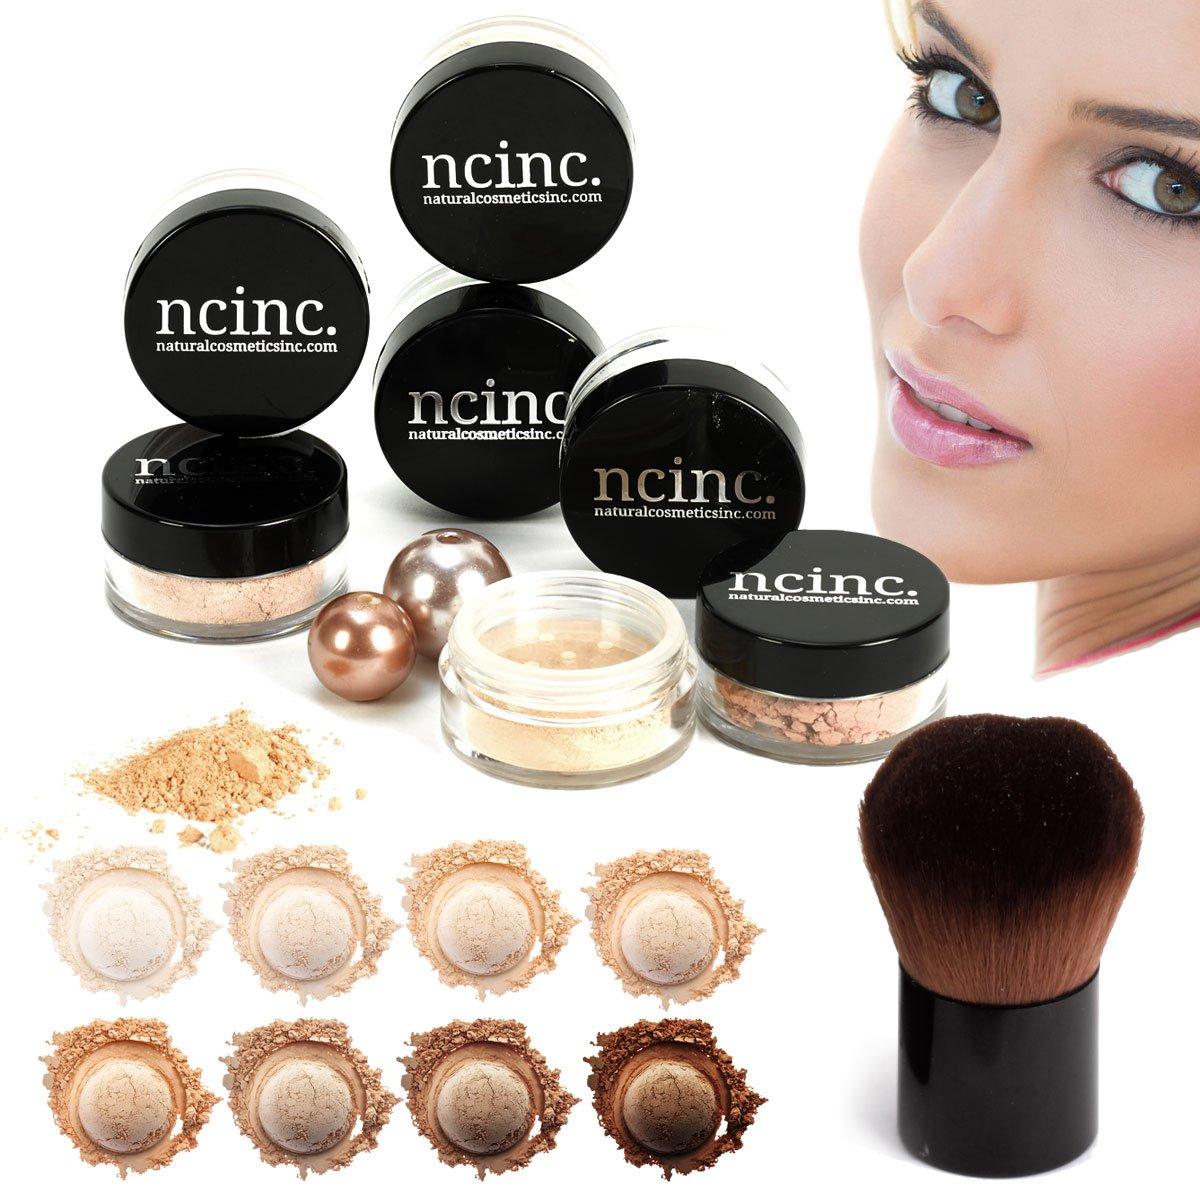 LIGHT SKIN 8pc Bare Naked Skin Mineral Makeup Set (Medium) by NCinc. + Kabuki Brush. Minerals Makeup Starter Kit NaturalCosmeticsInc